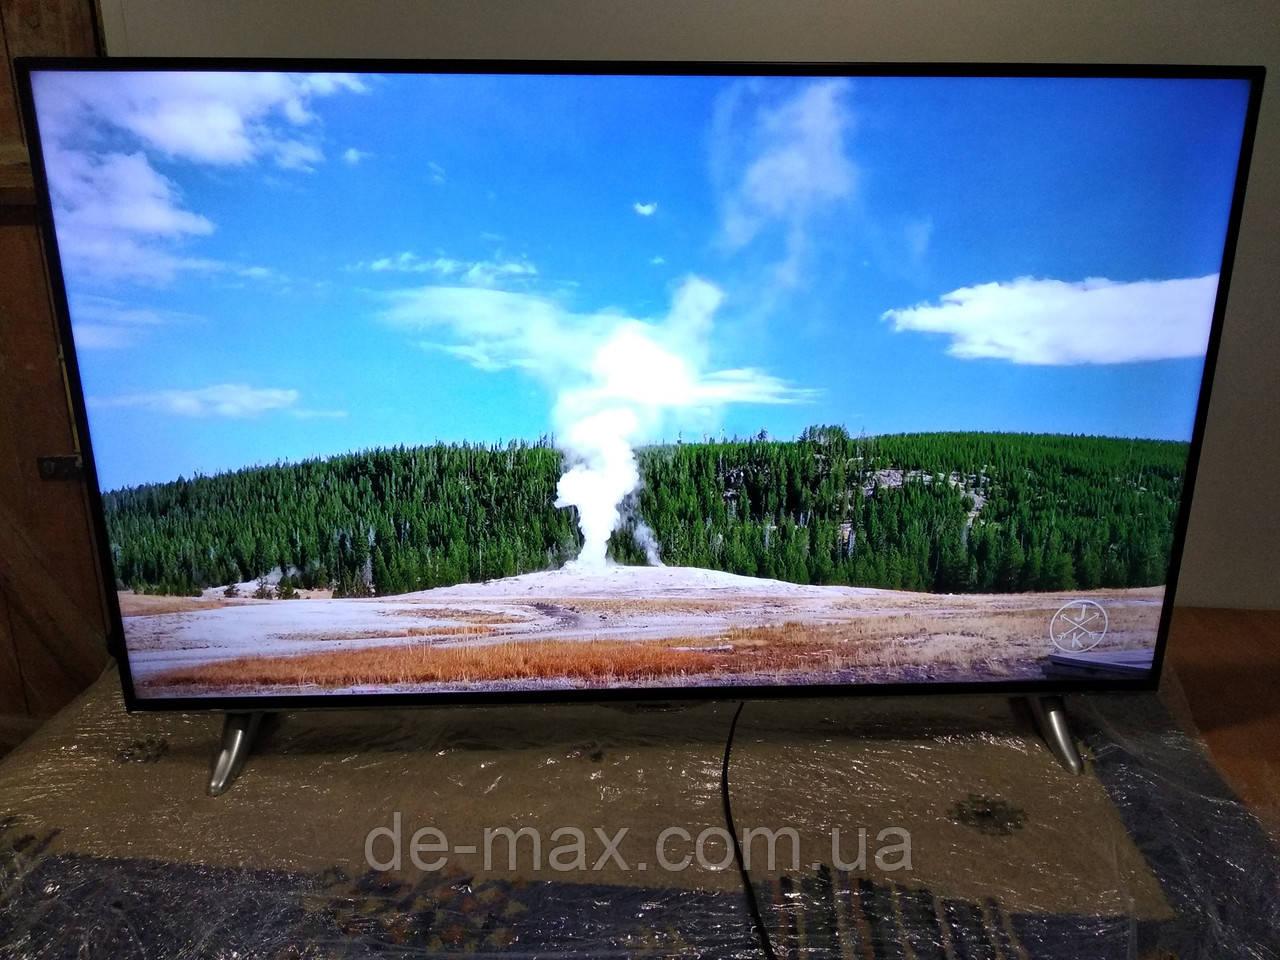 Телевизор 48 дюймов Panasonic TX-48CXW404 UHD 4K Smart TV 3D Т2